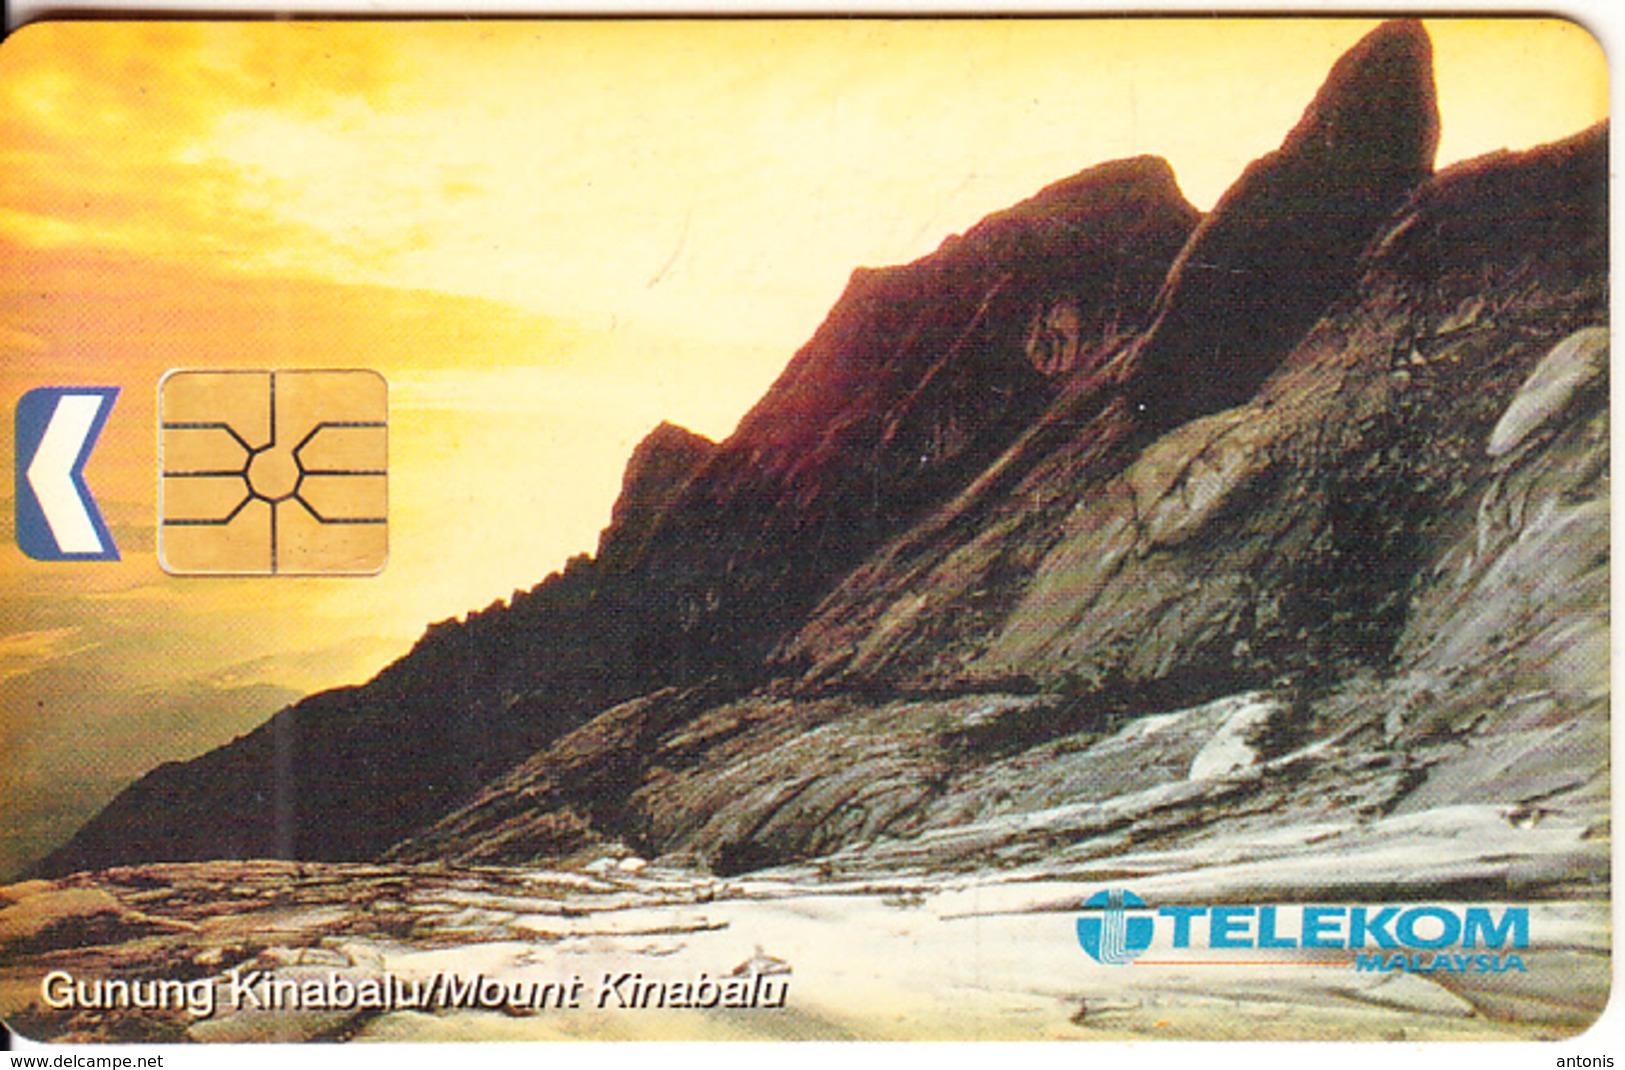 MALAYSIA(chip) - Mount Kinabalu, Telecom Malaysia Telecard RM20, Chip GEM1.1, Used - Mountains